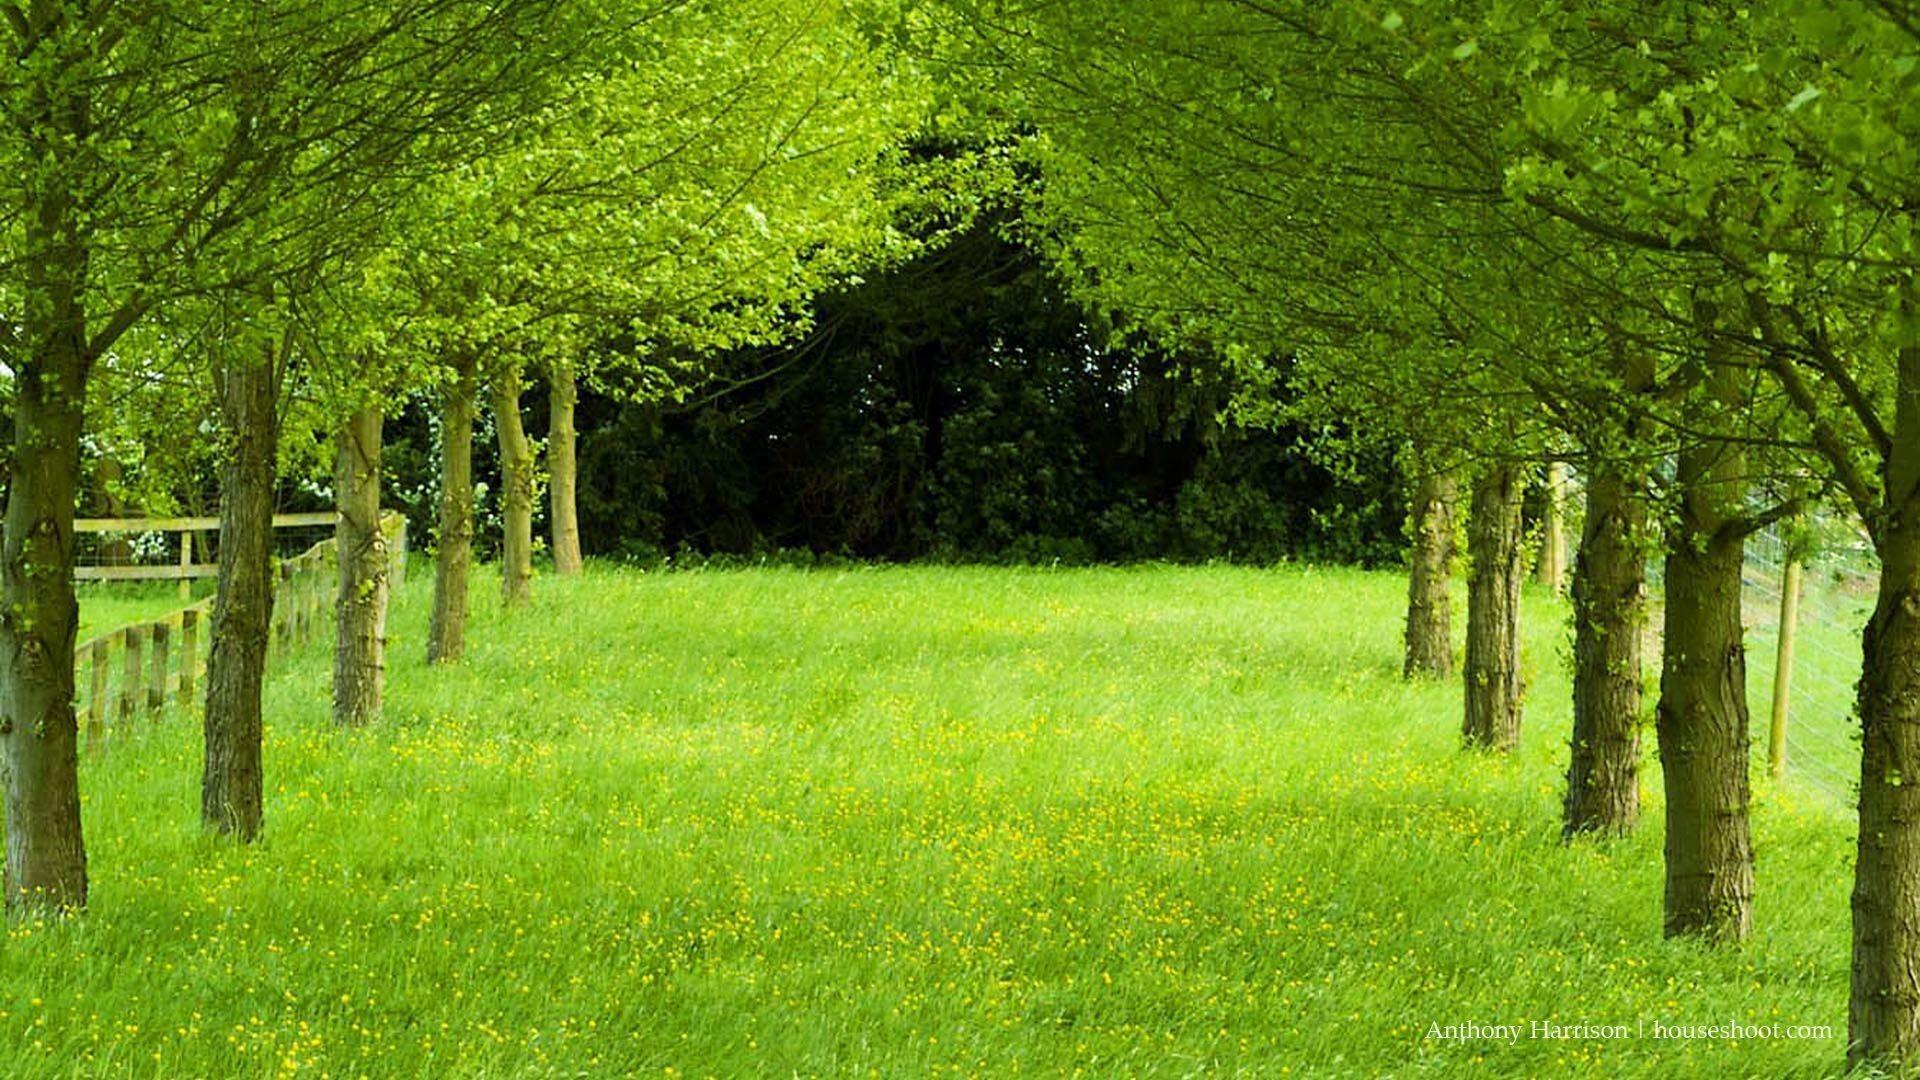 Free Desktop Wallpaper Description Free Download Green Road